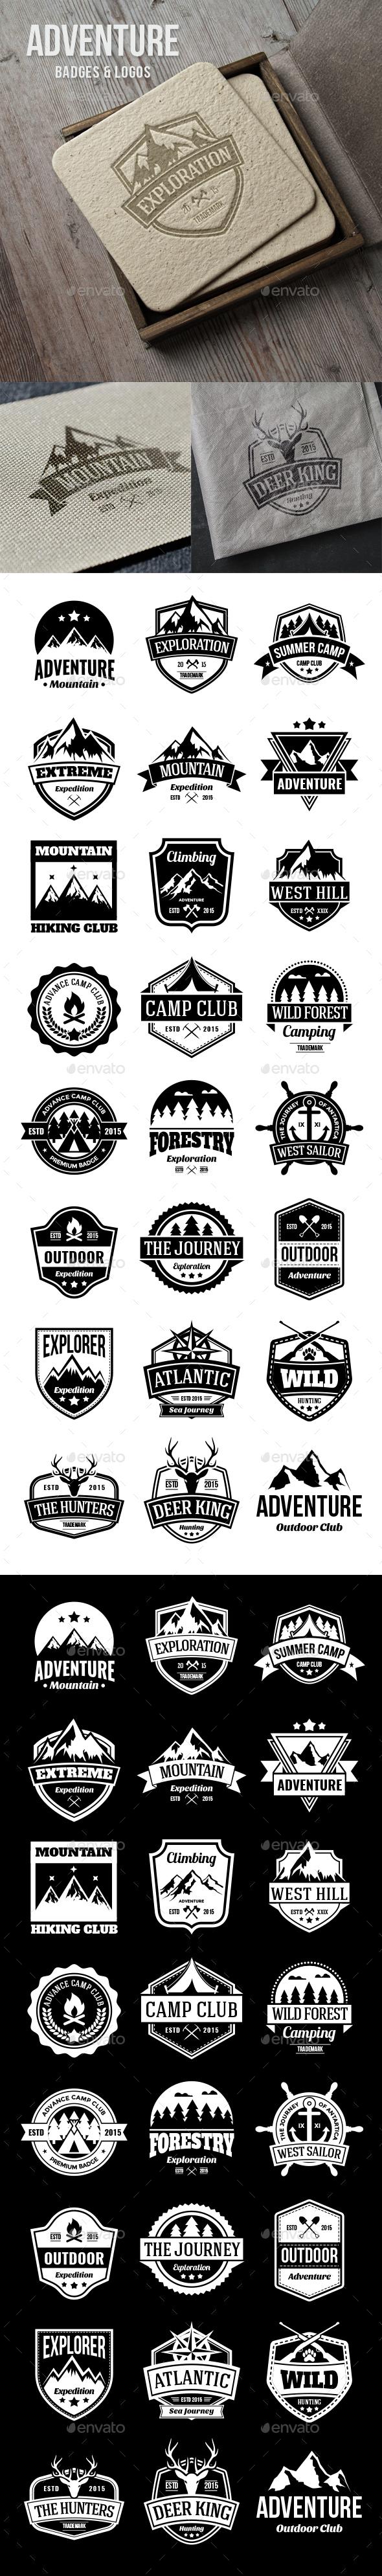 24 Adventure Badges - Badges & Stickers Web Elements